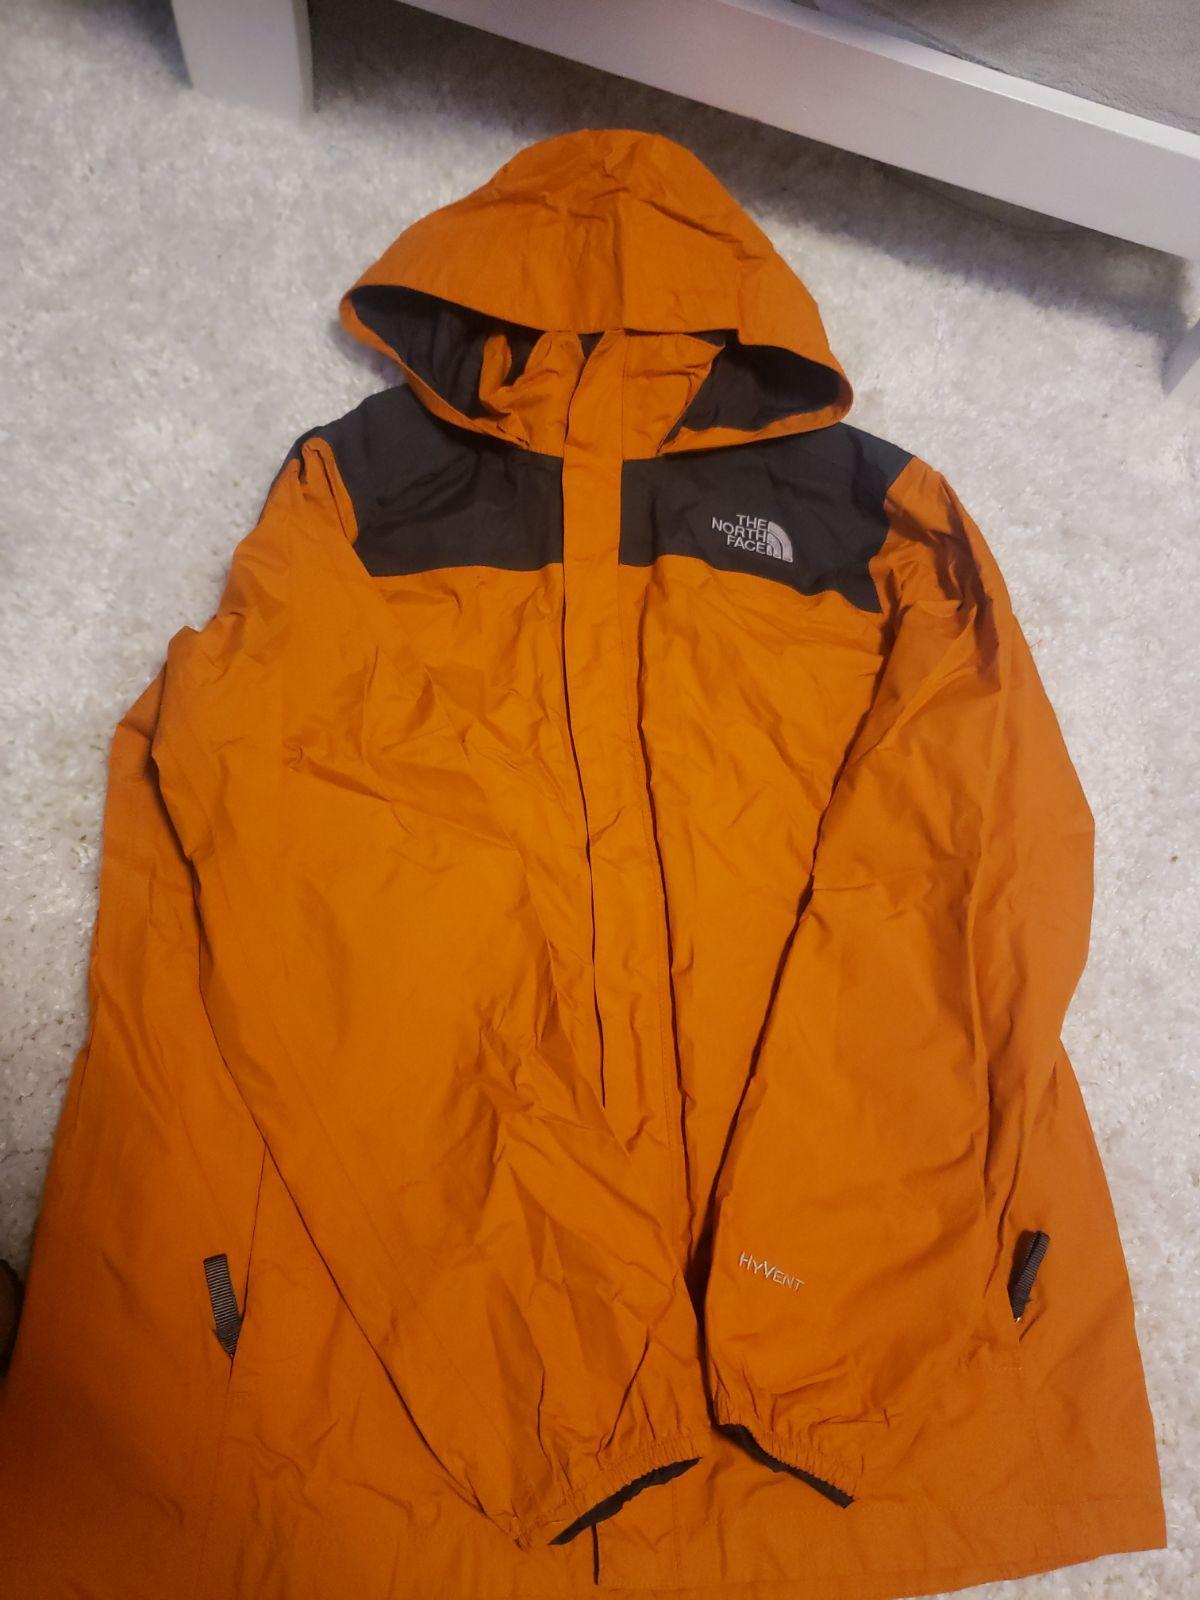 Boys Xl Northface Windbreaker Jacket Orange And Grey Good Used Condition North Face Coat Windbreaker Jacket Jackets [ 1600 x 1200 Pixel ]